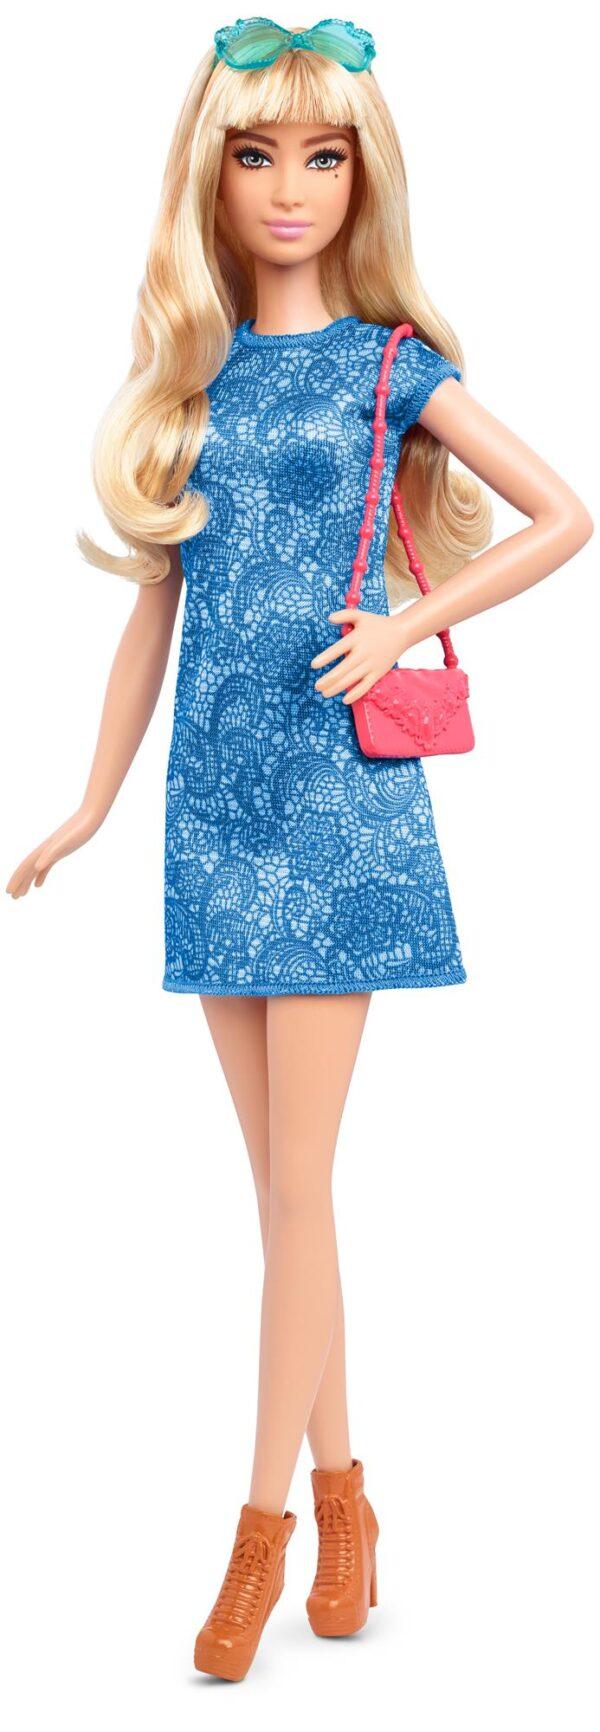 ALTRI Barbie Femmina 12-36 Mesi, 12+ Anni, 3-5 Anni, 5-8 Anni, 8-12 Anni Barbie  - Bambola Fashionista e Moda - Love Pizza